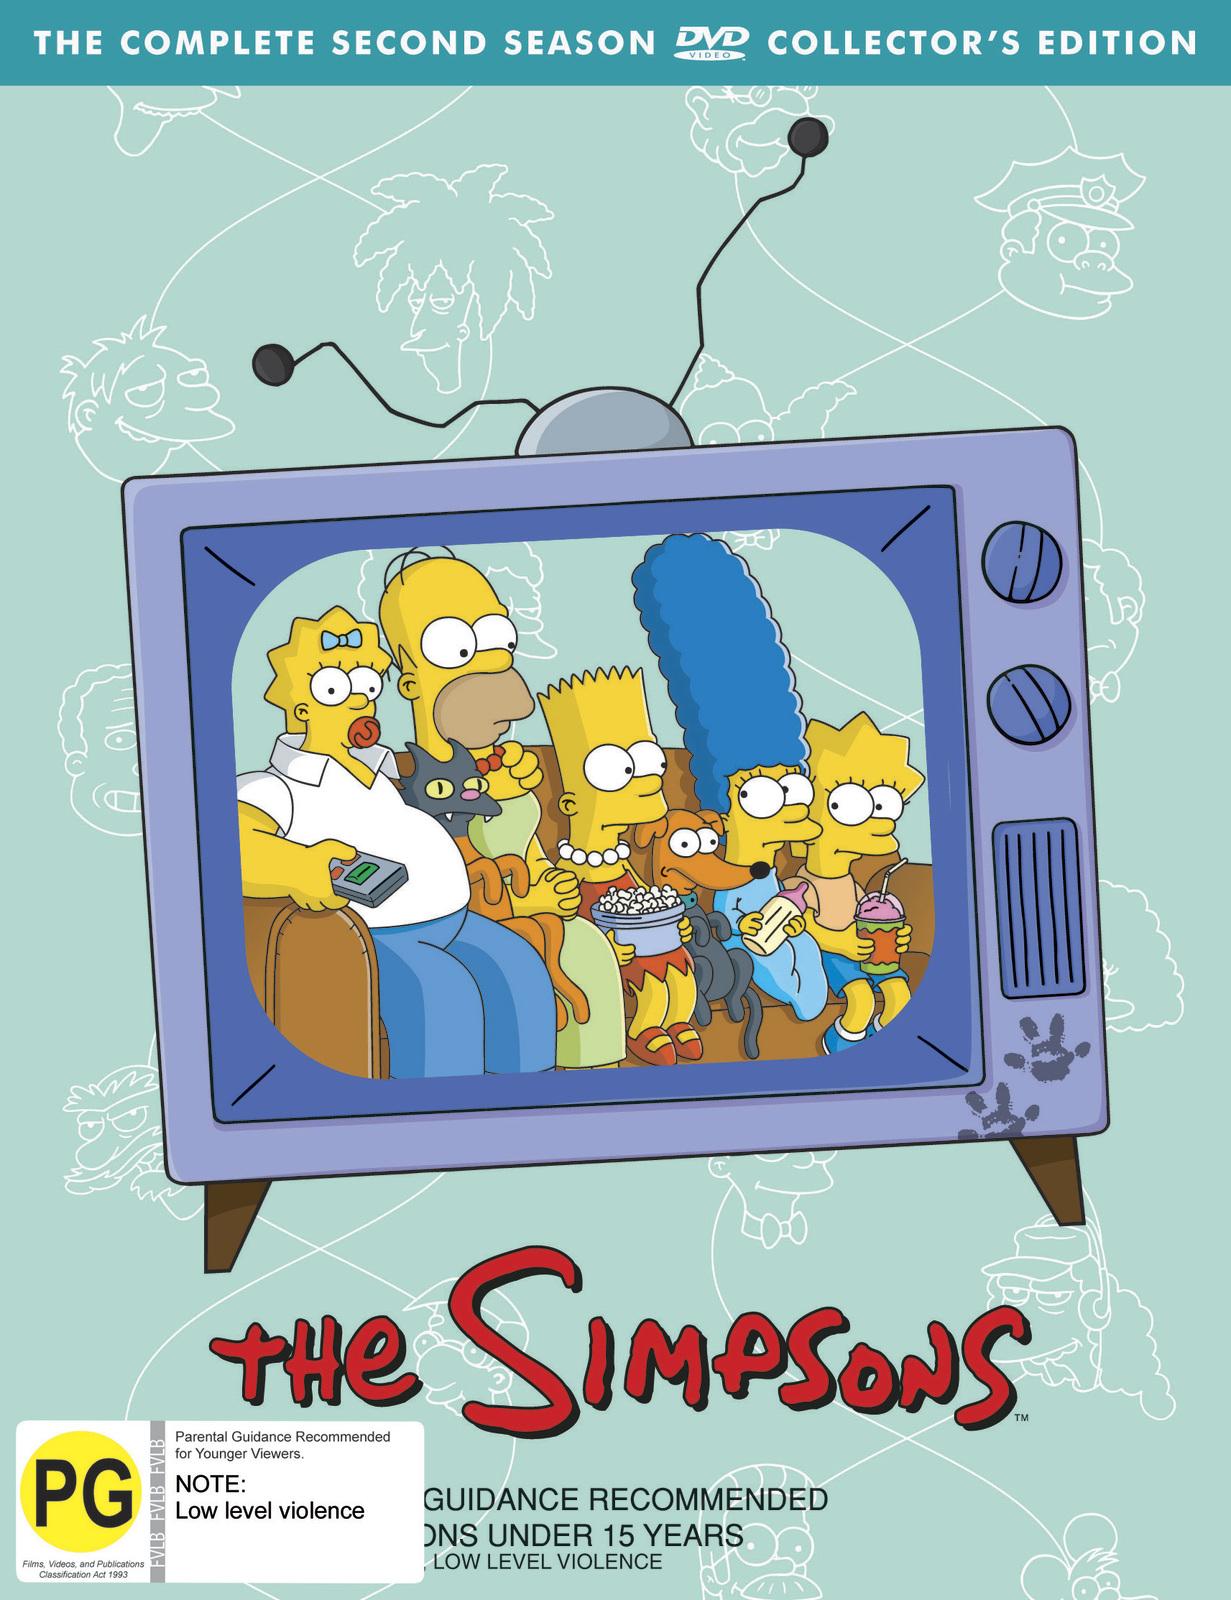 The Simpsons - Season 2 on DVD image